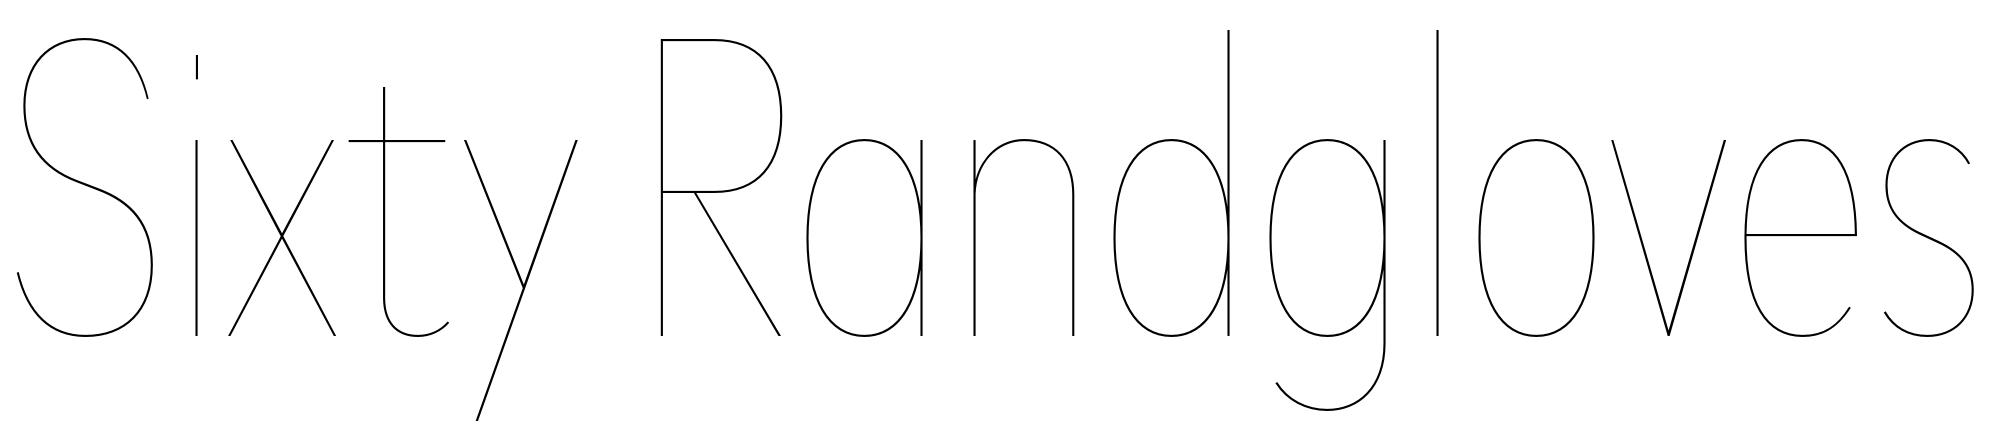 Download neuzeit Office Font zip rar